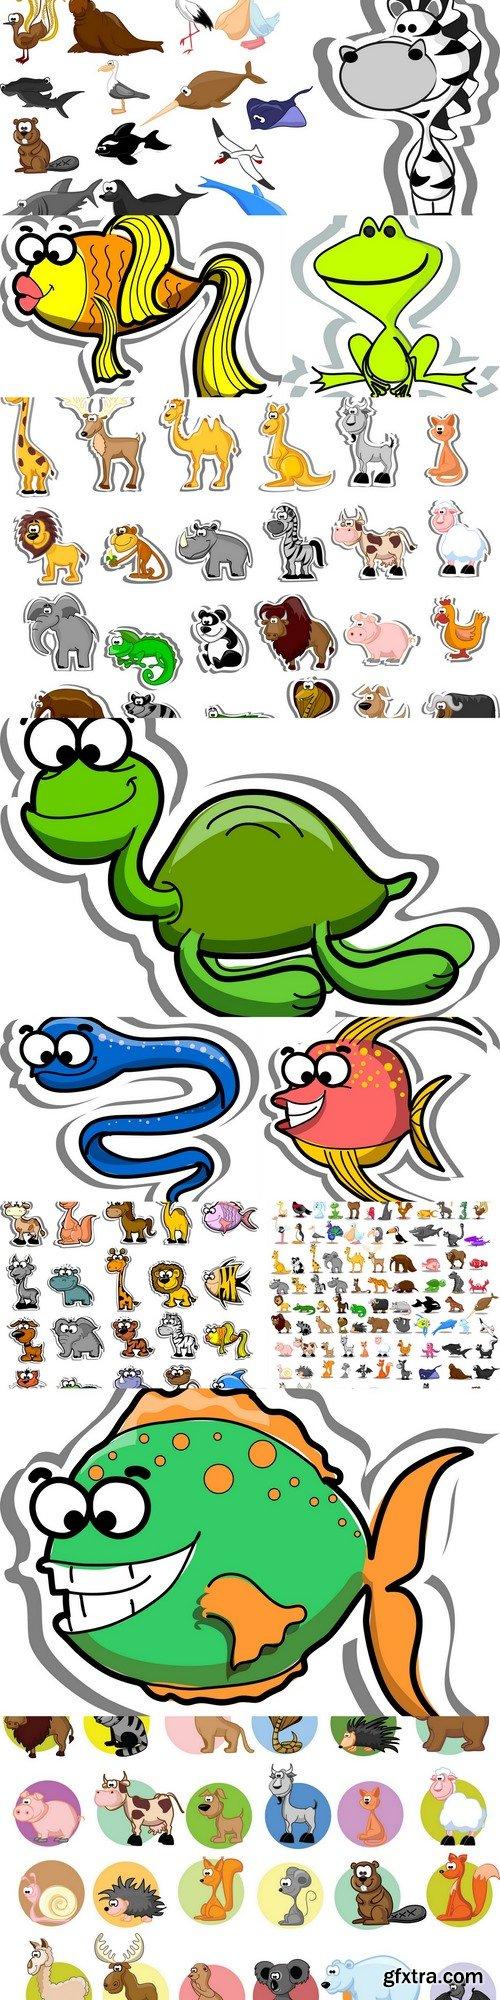 Cartoon animals and fish